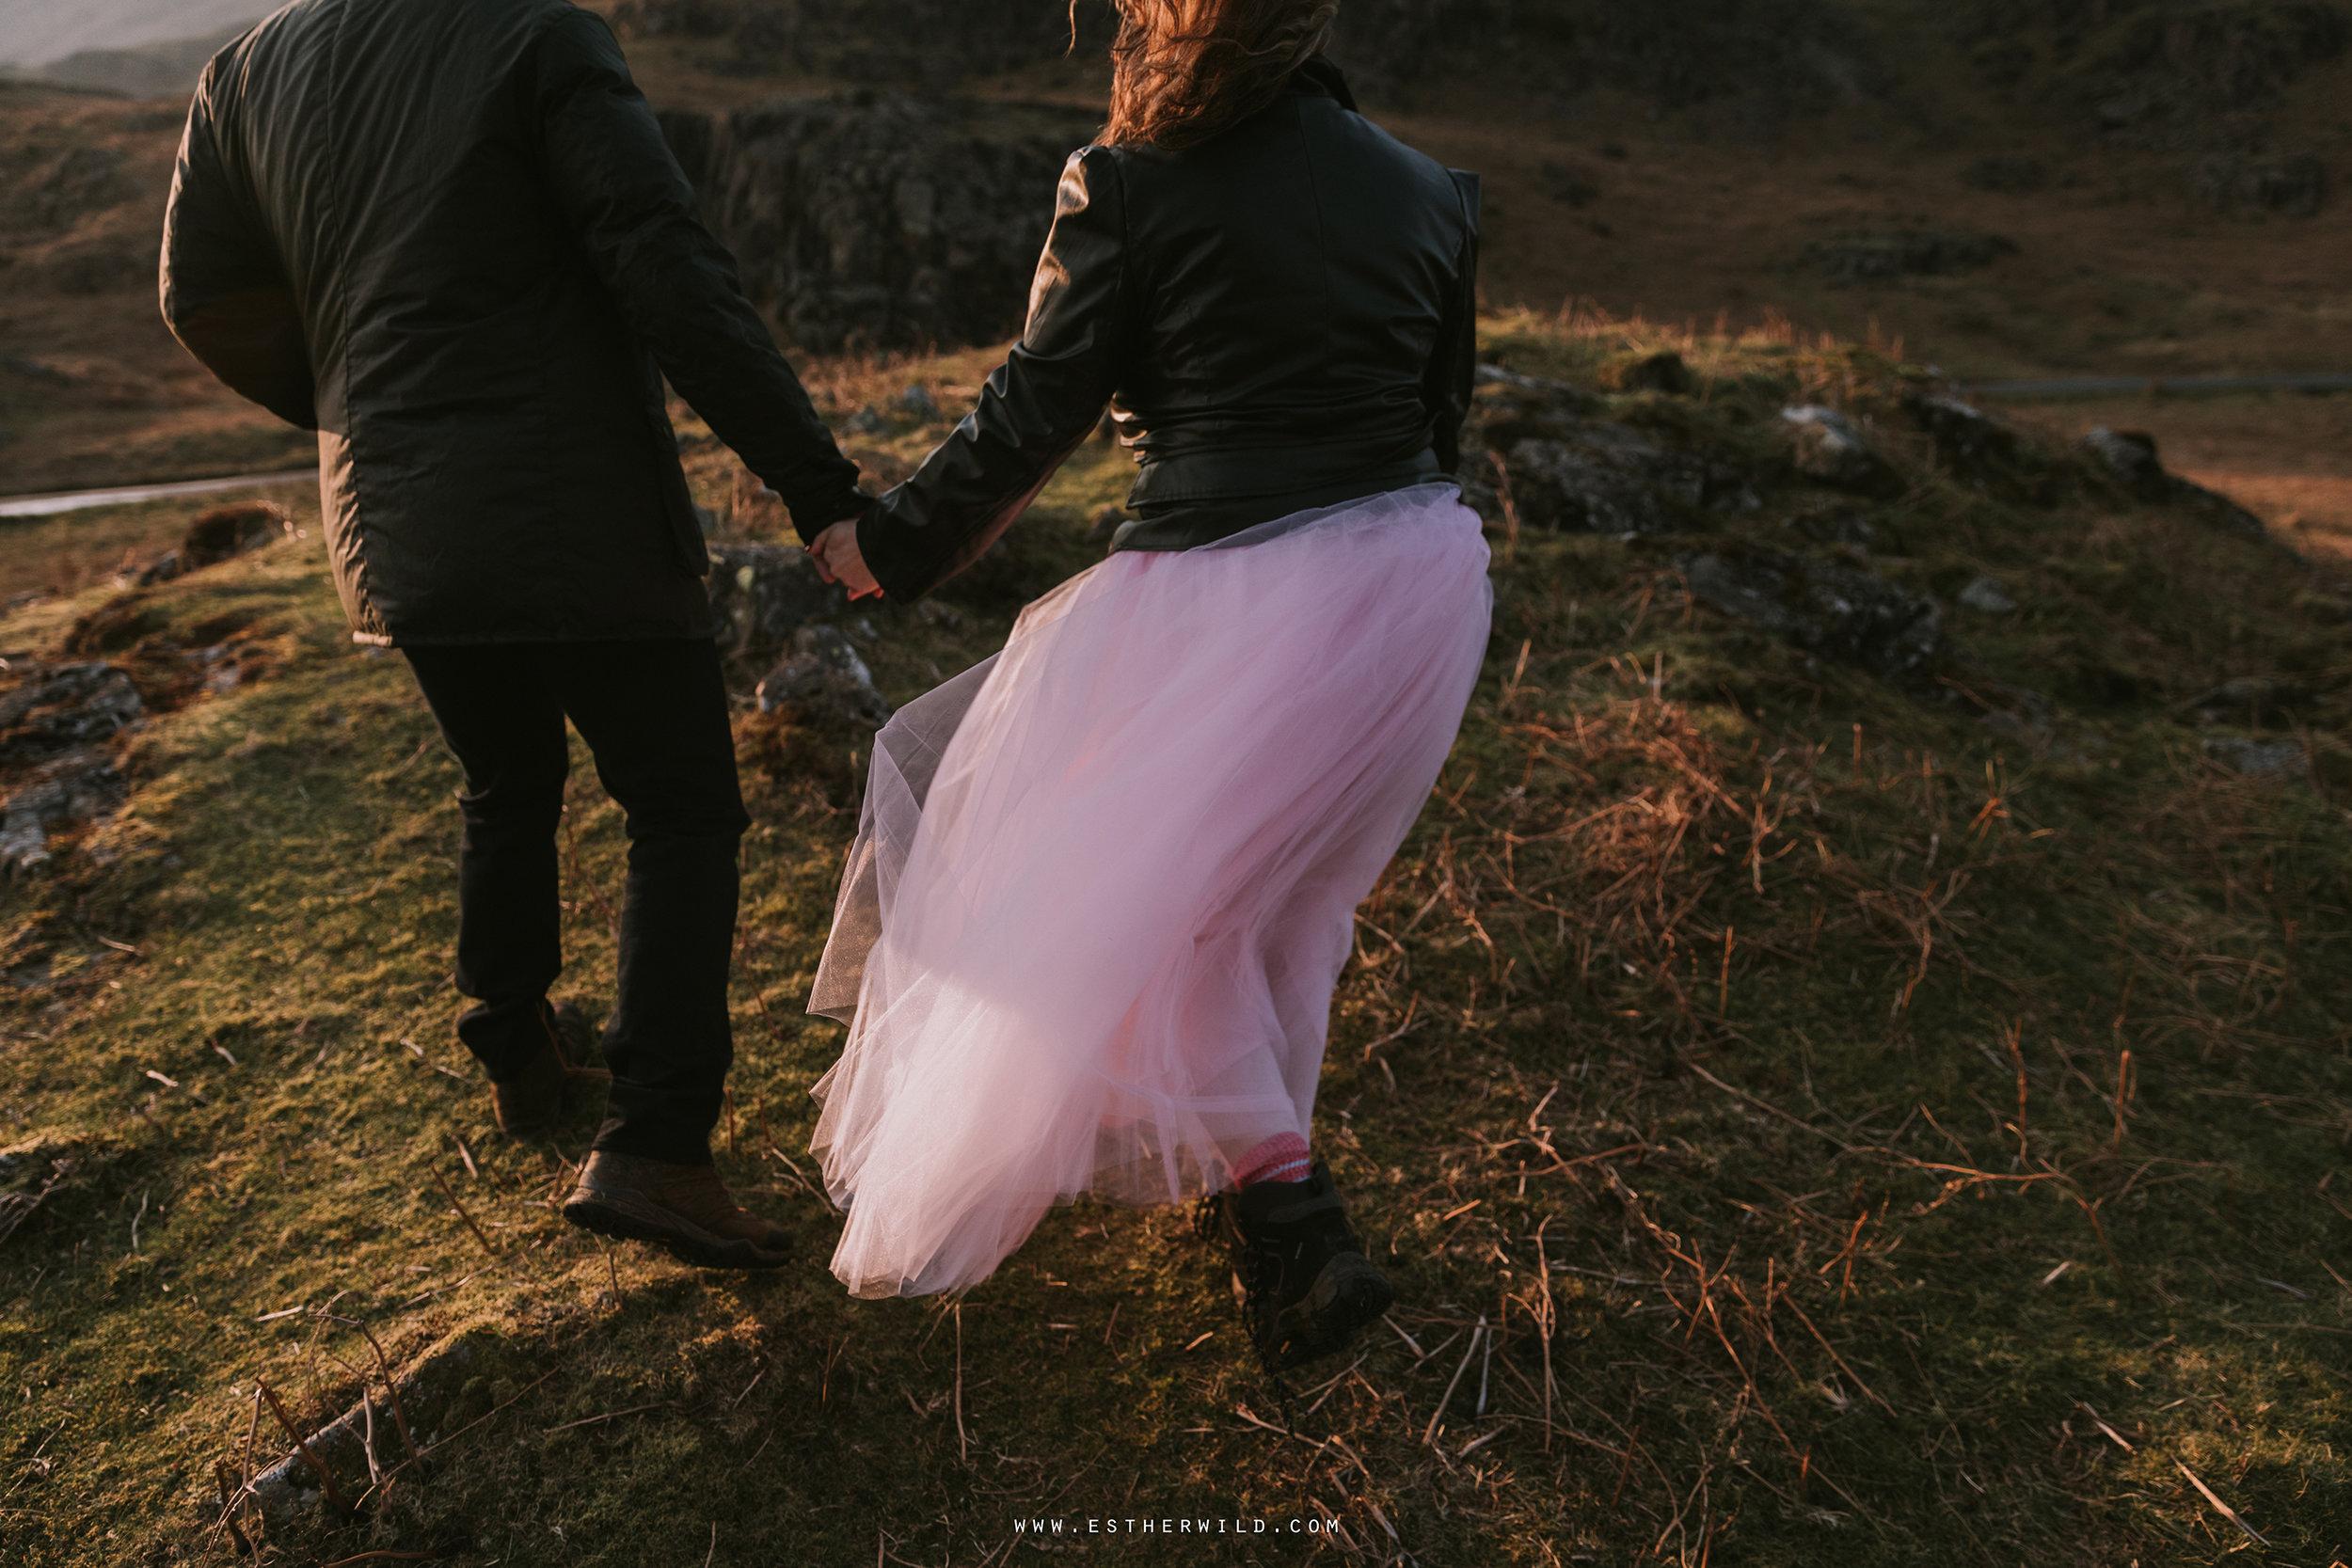 Cumbria_Lake_District_Wasdale_Wedding_Photographer_Destination_Engagement_Anniversary_Esther_Wild_IMG_4487.jpg